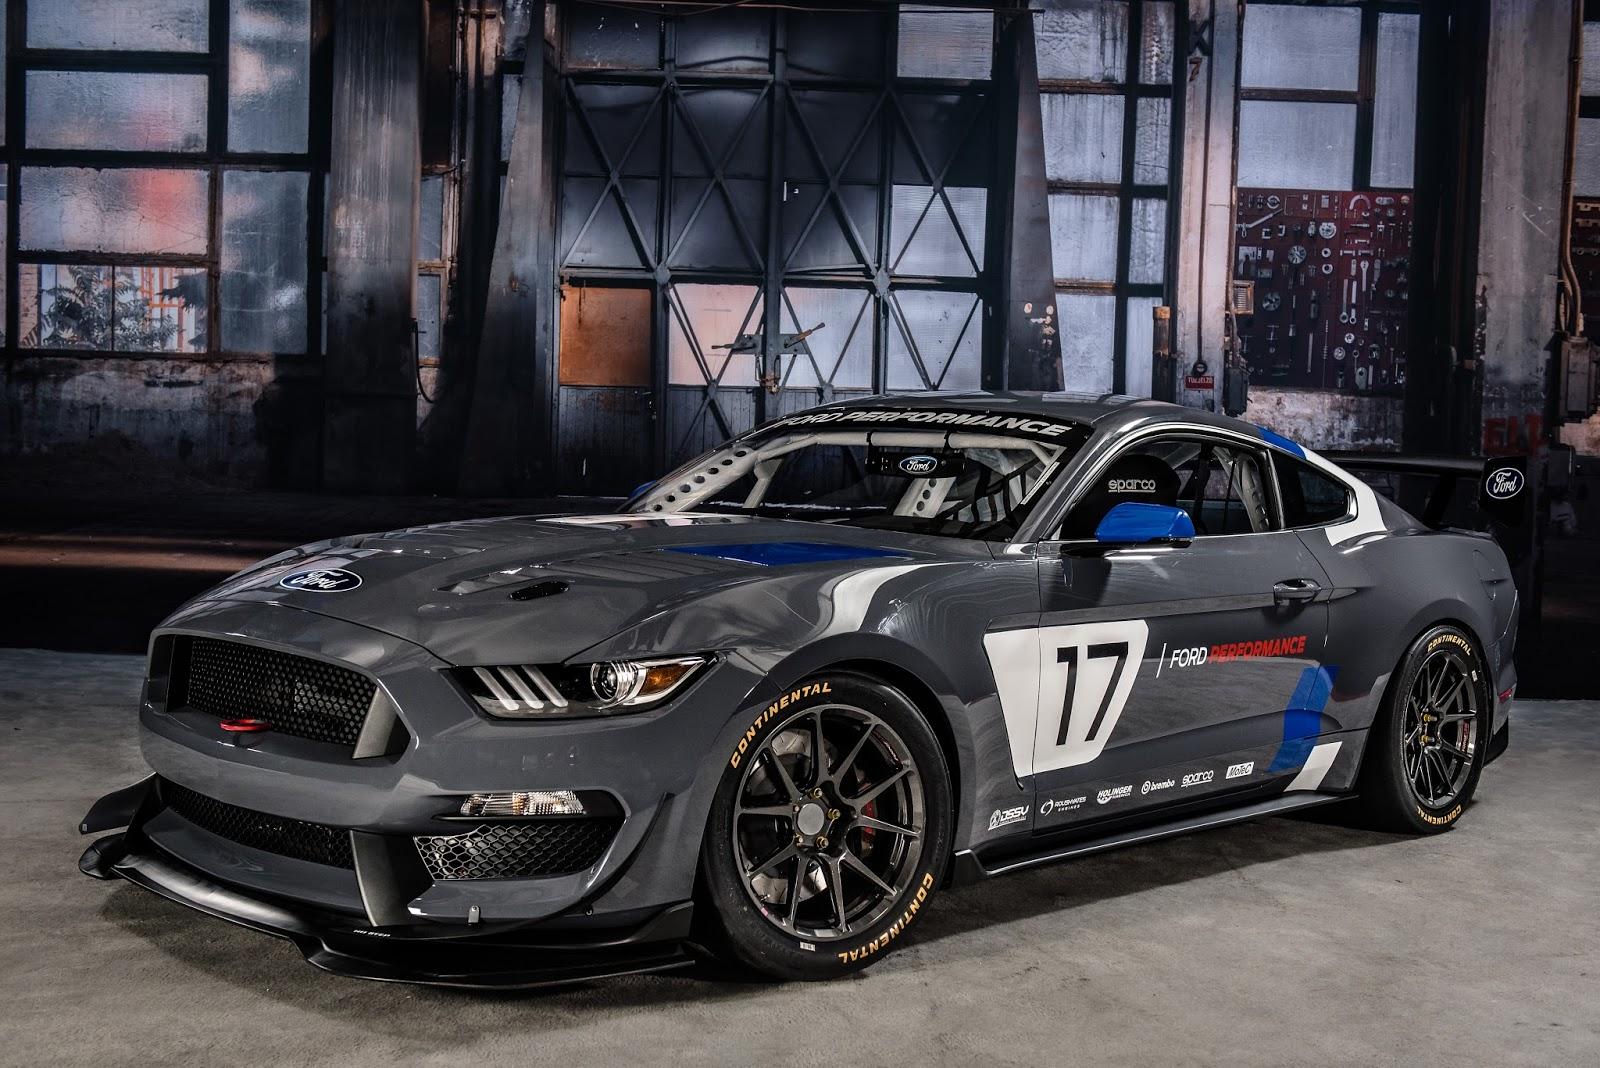 Mustang GT350R C4 Ford Performance 4 Η Ford Performance παρουσίασε την αγωνιστική Mustang GT4 στην έκθεση SEMA 2016 και ένα ...application για γρήγορους γύρους στην πίστα! App, autoshow, Ford, Ford Mustang, Ford Mustang GT4, Ford Performance, SEMA, videos, Τεχνολογία